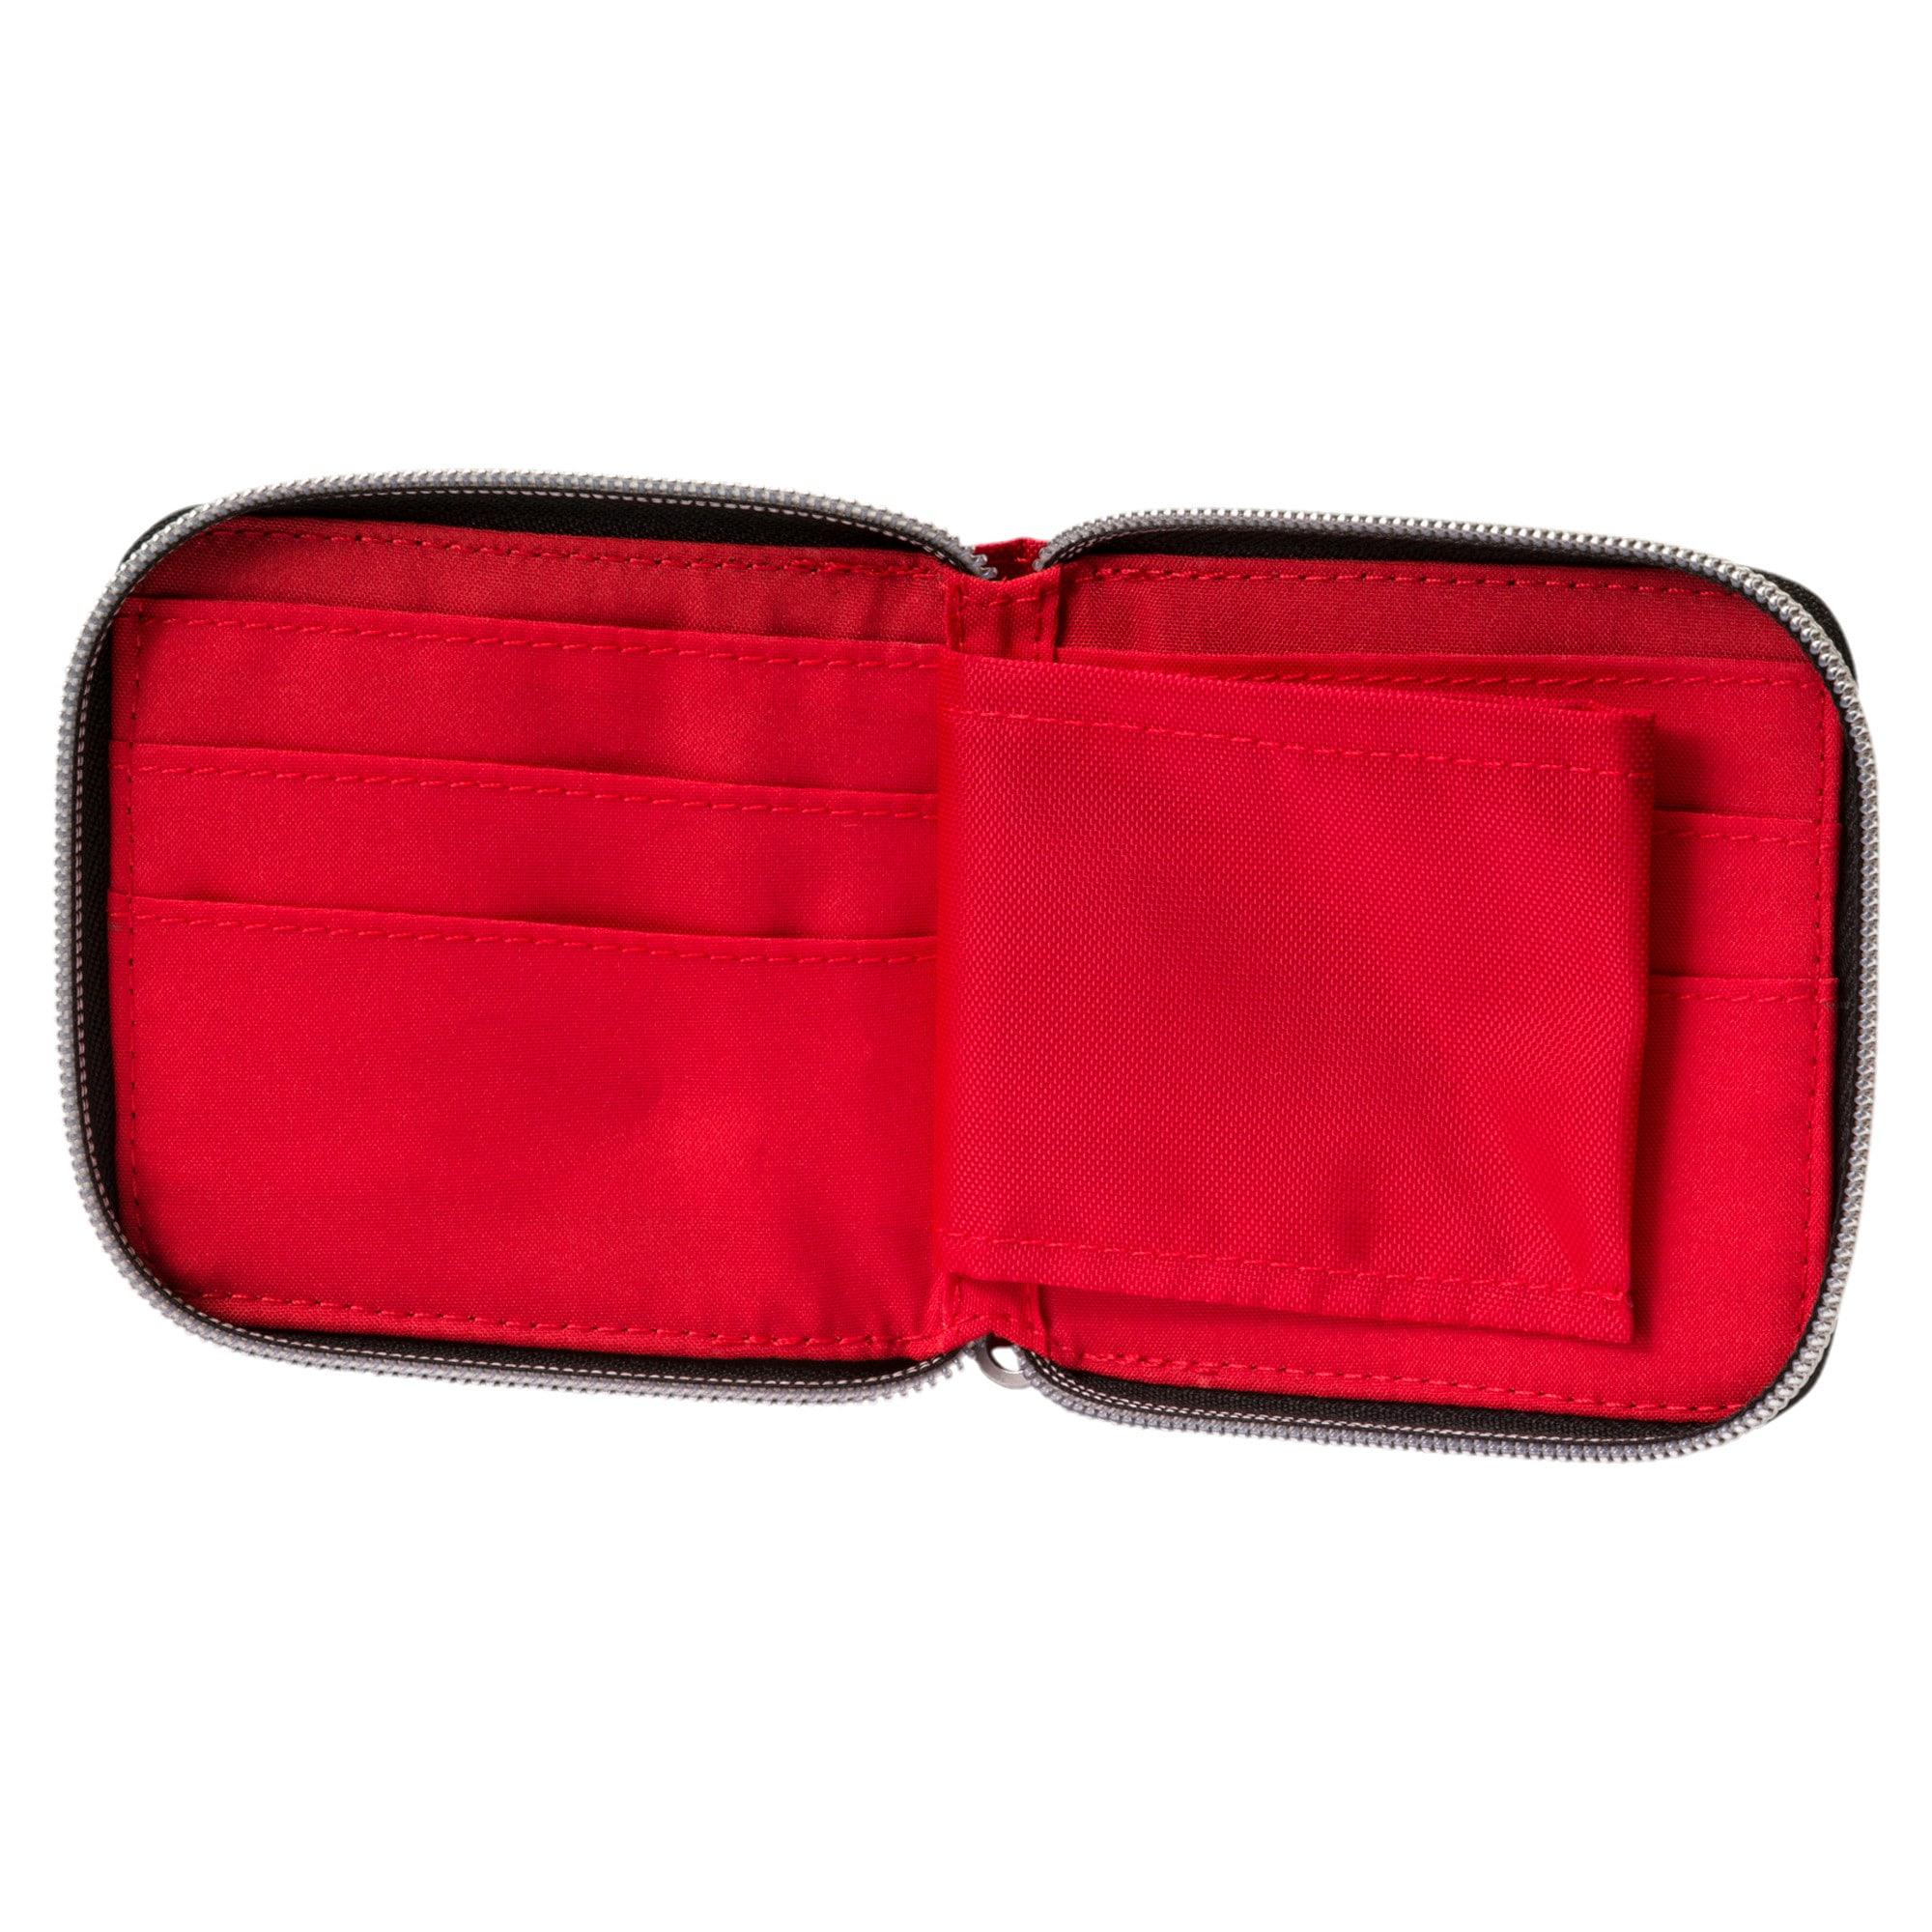 Thumbnail 3 of Scuderia Ferrari Fanwear Wallet, Rosso Corsa, medium